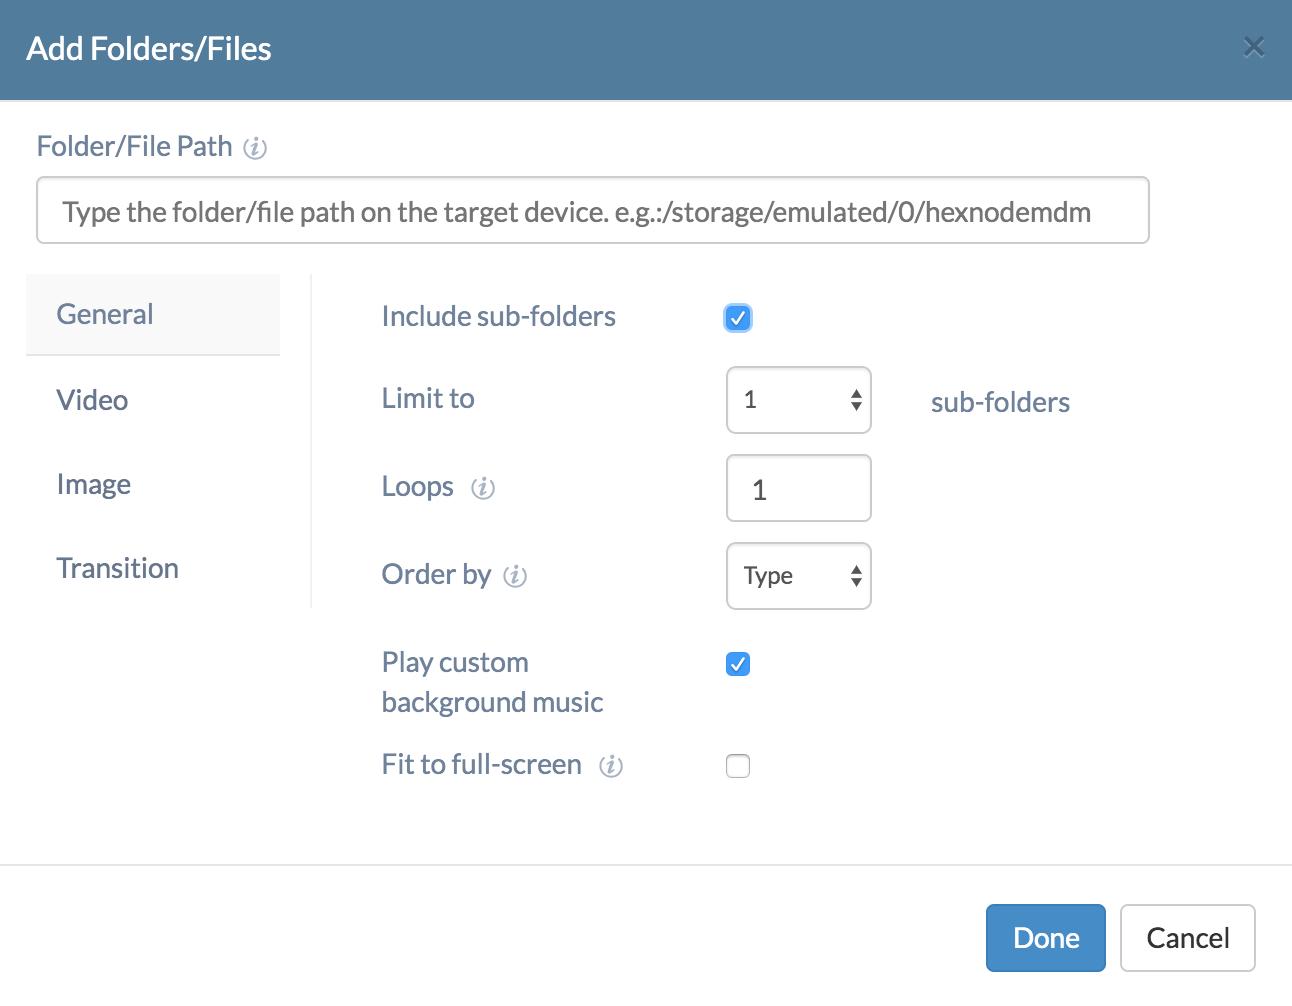 Adding folders/files